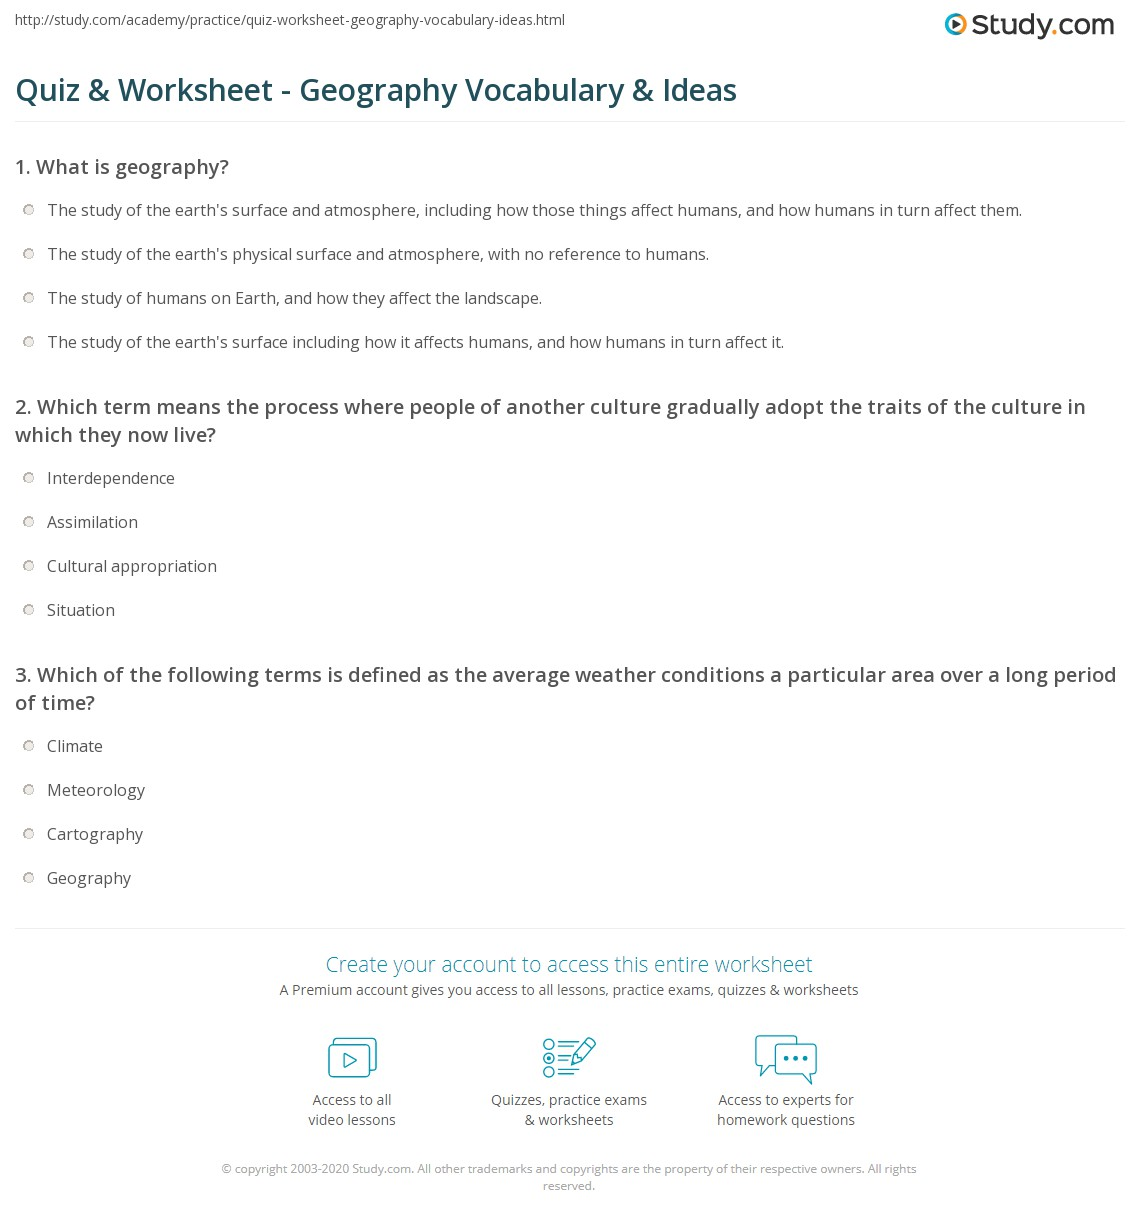 Quiz & Worksheet - Geography Vocabulary & Ideas | Study.com